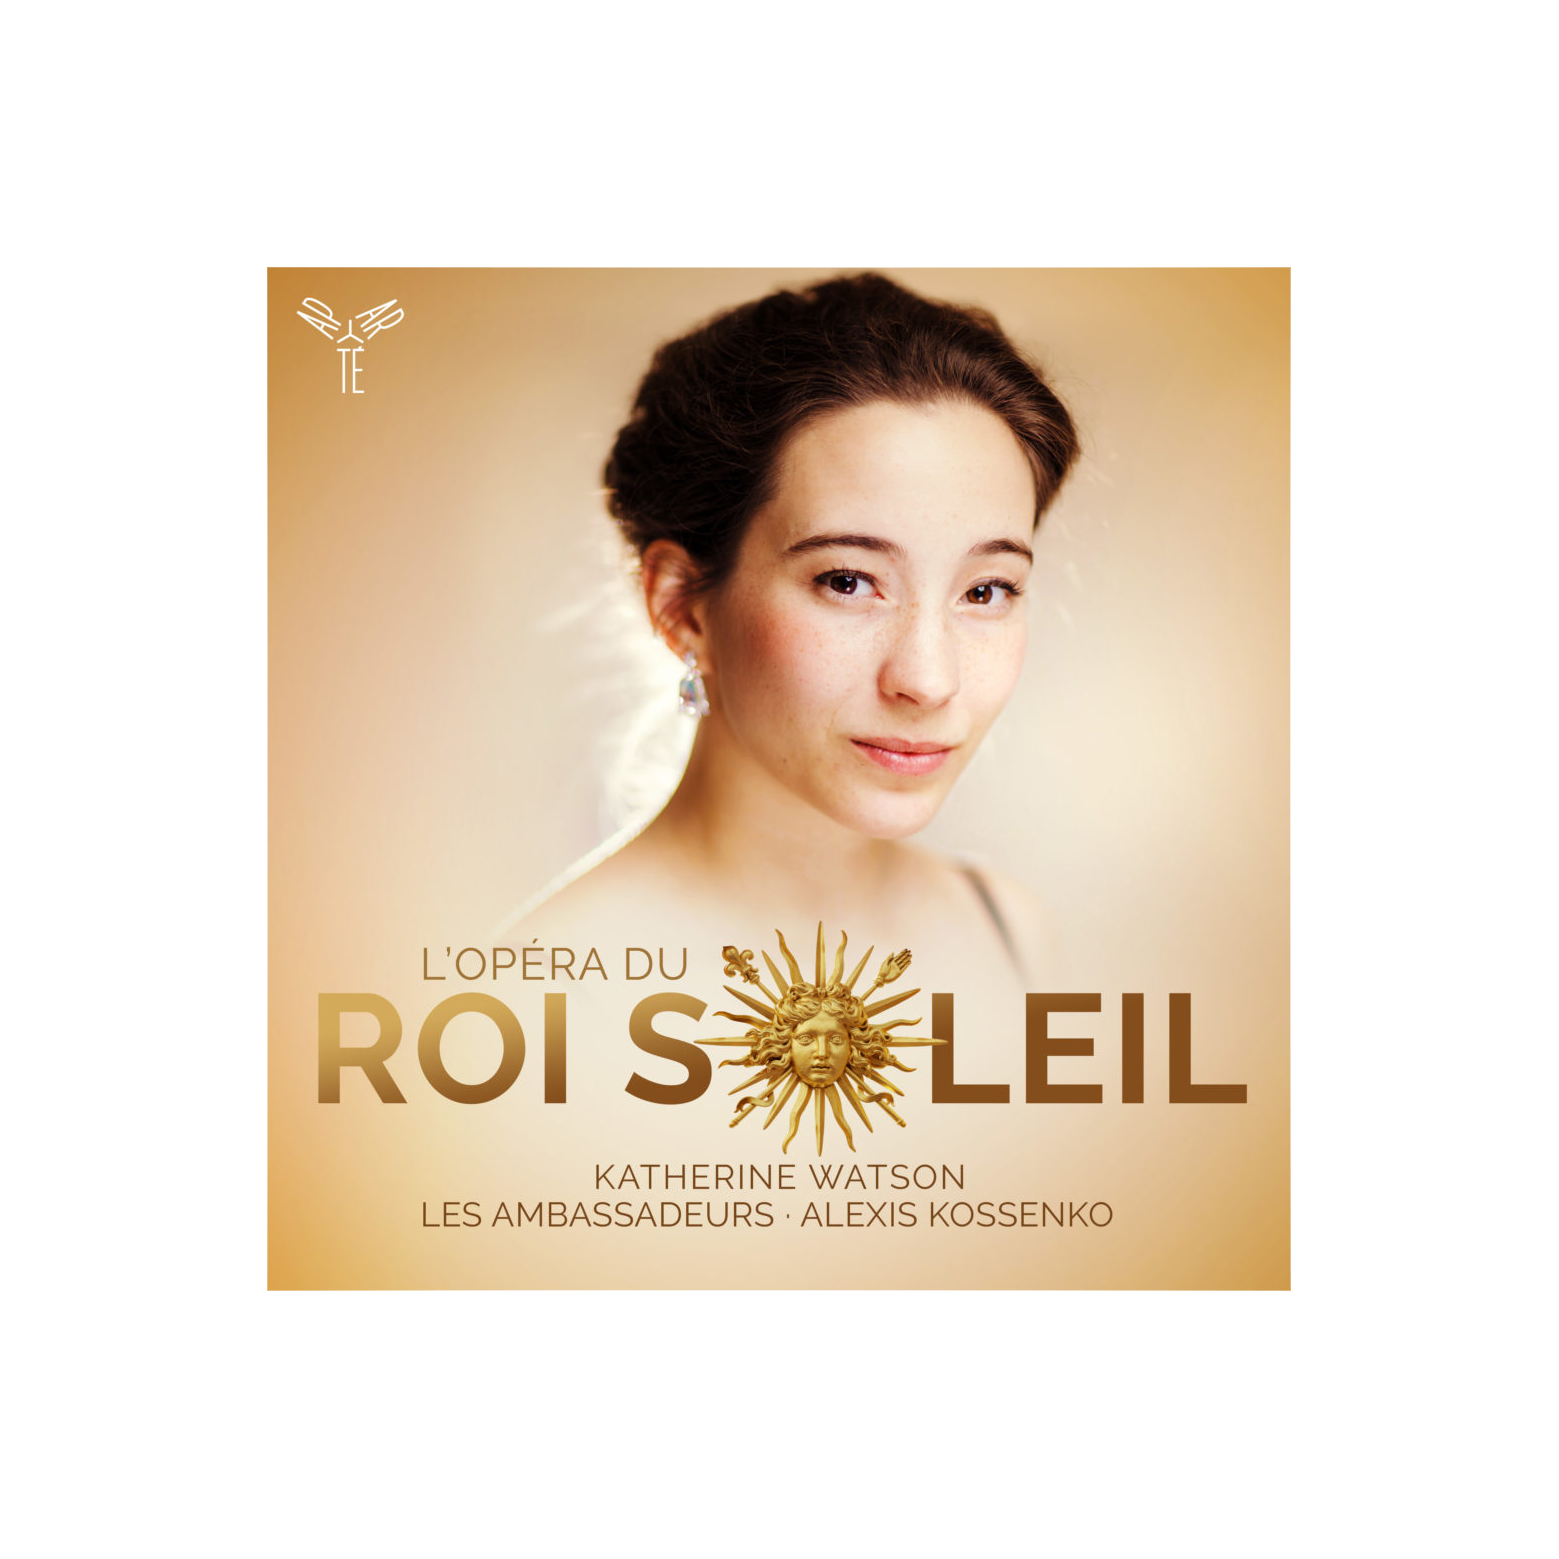 pochette CD Roi Soleil Aparte agrandie